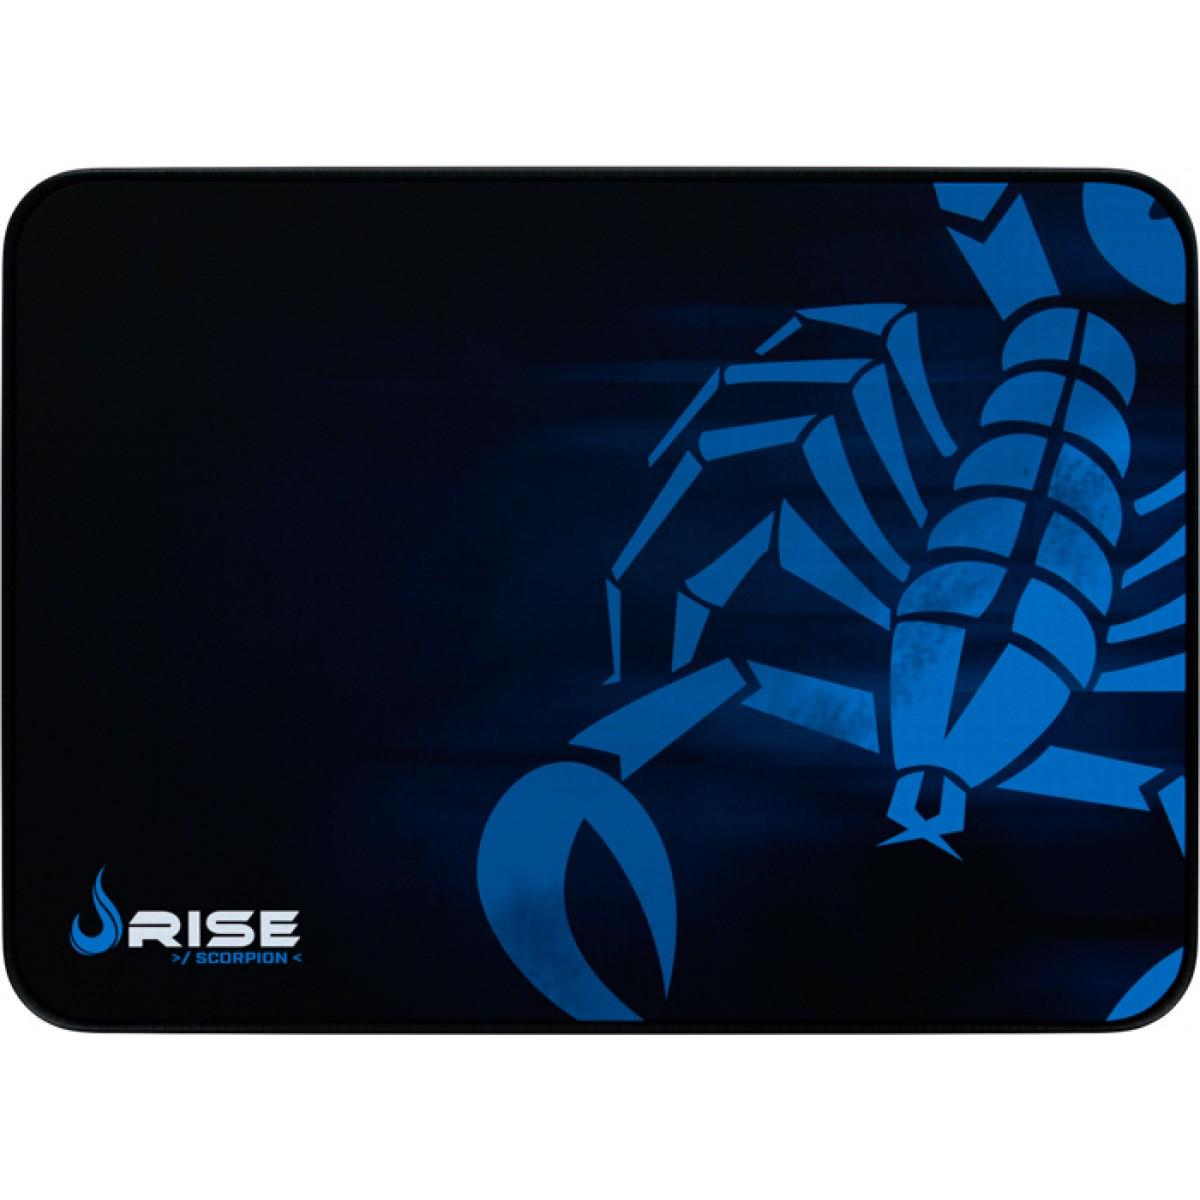 Mouse Pad Gamer Rise Scorpion, Médio, Borda Costurada, RG-MP-04-SK